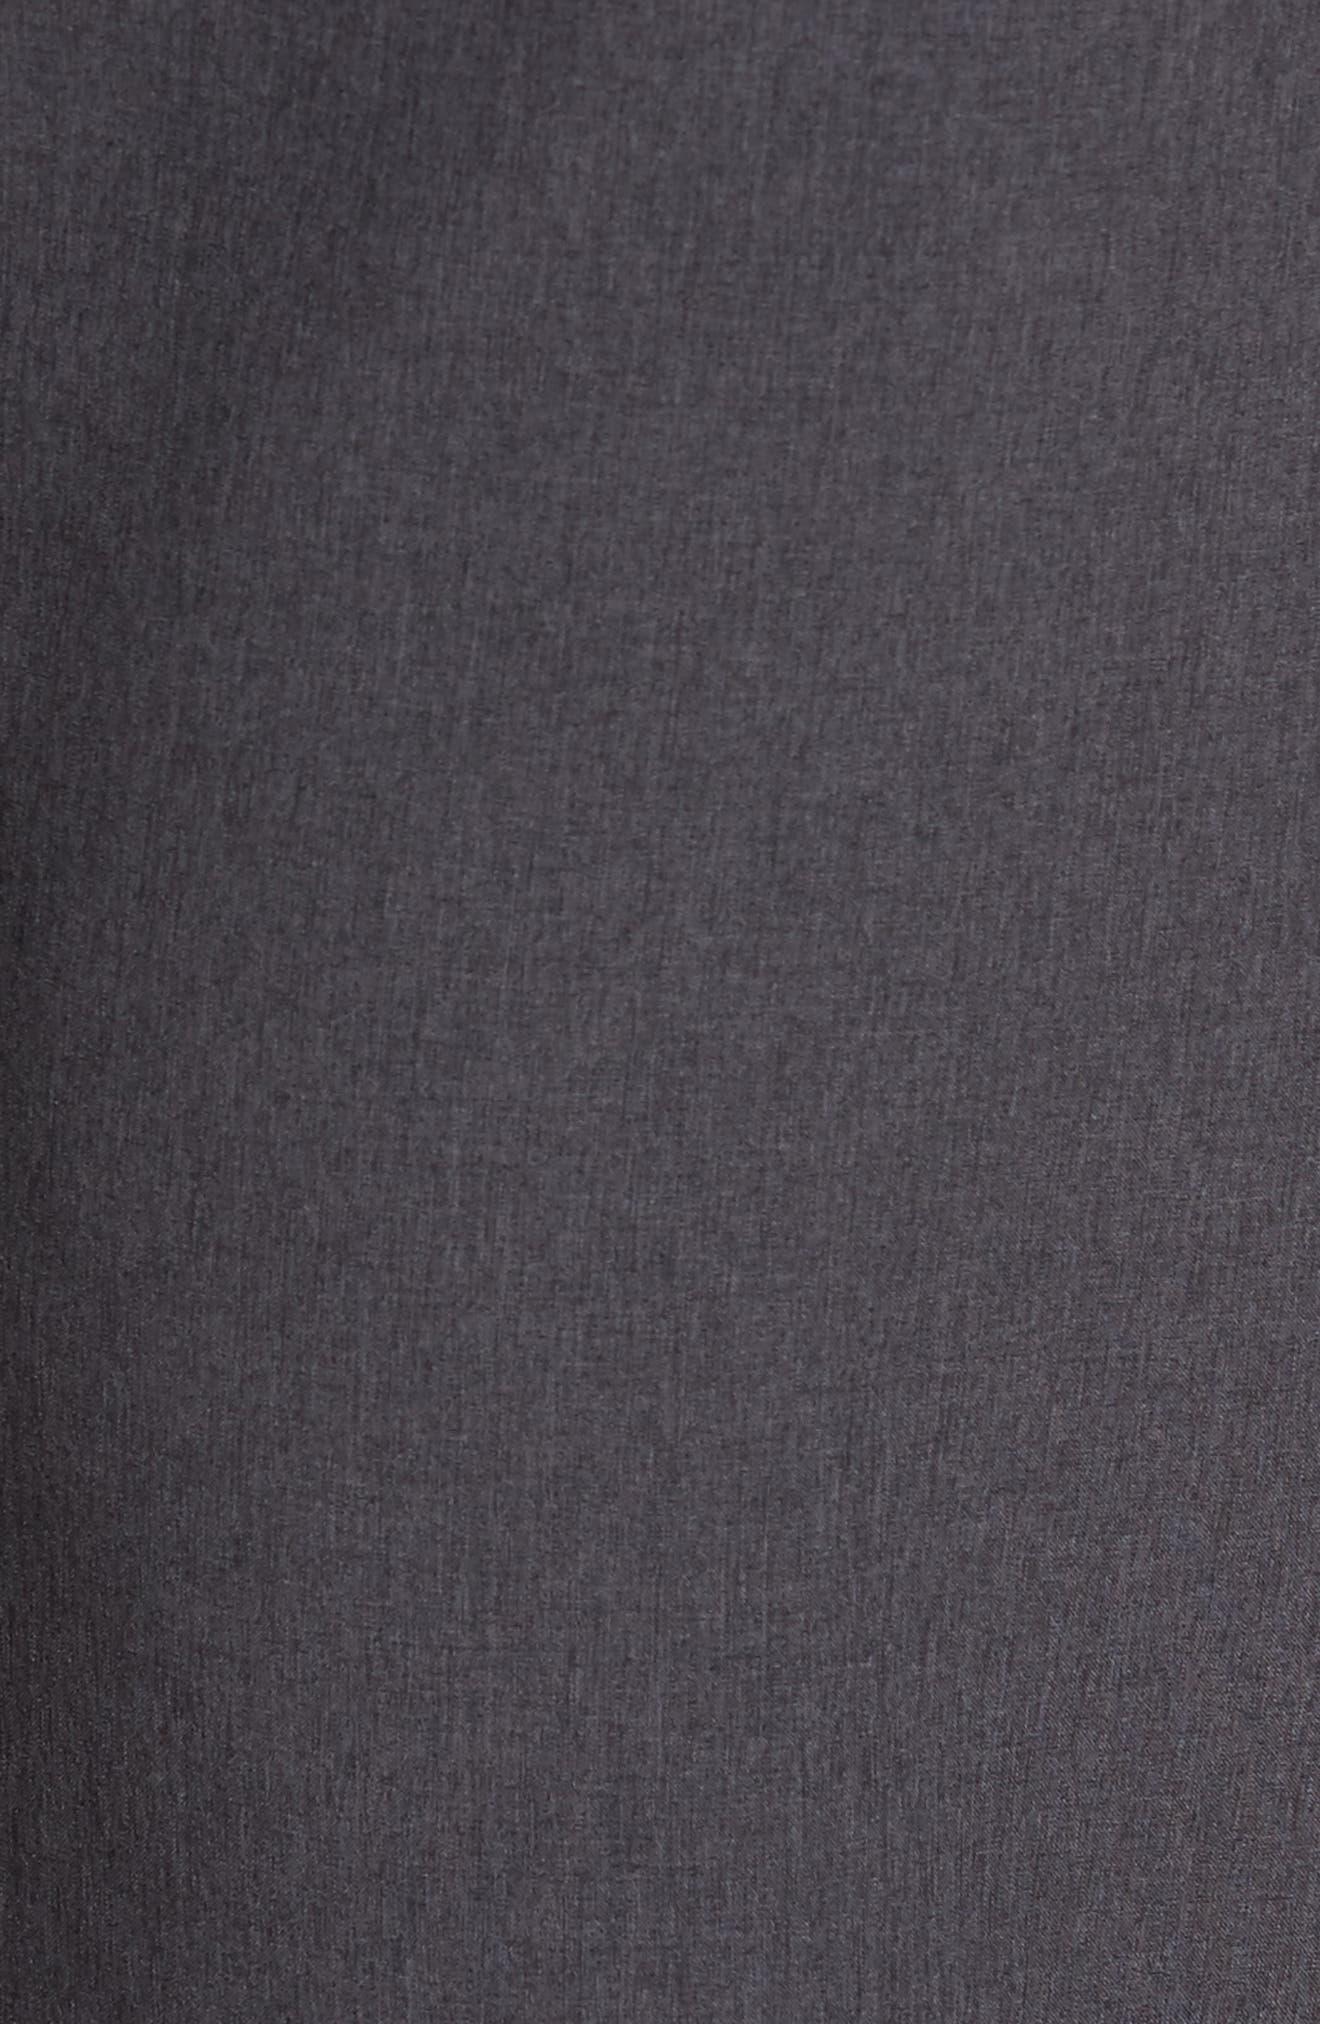 Pantladdium Pants,                             Alternate thumbnail 5, color,                             HEATHER BLACK